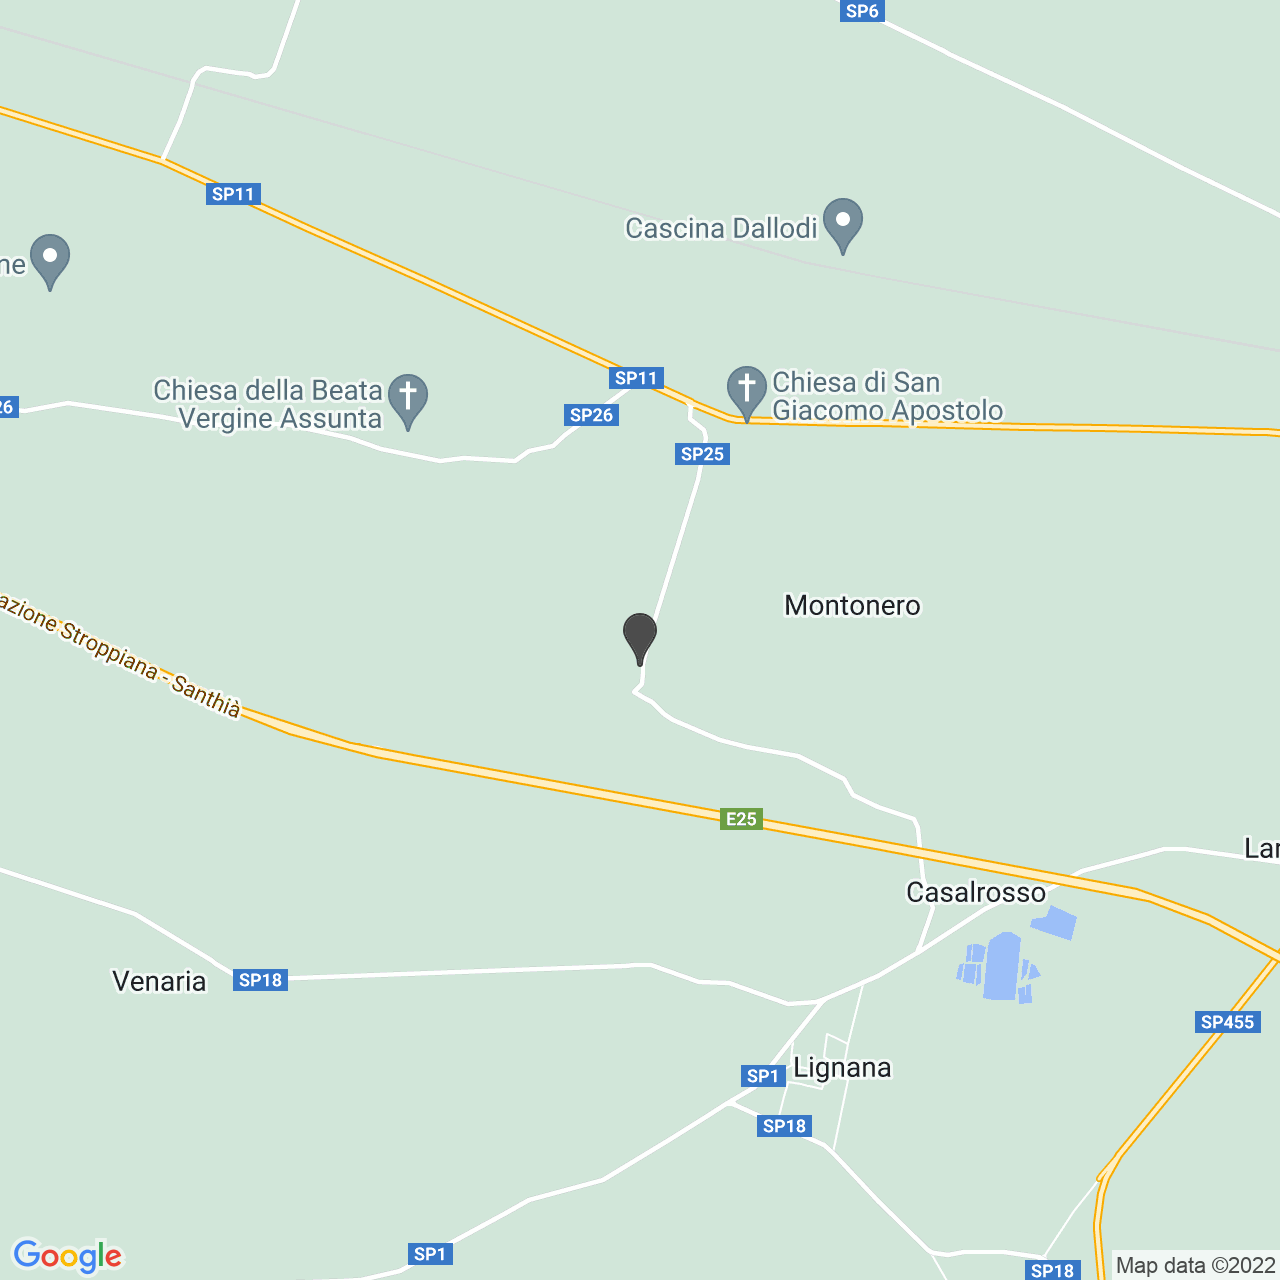 Chiesa dei Santi Desiderio, Giacomo e Clemente